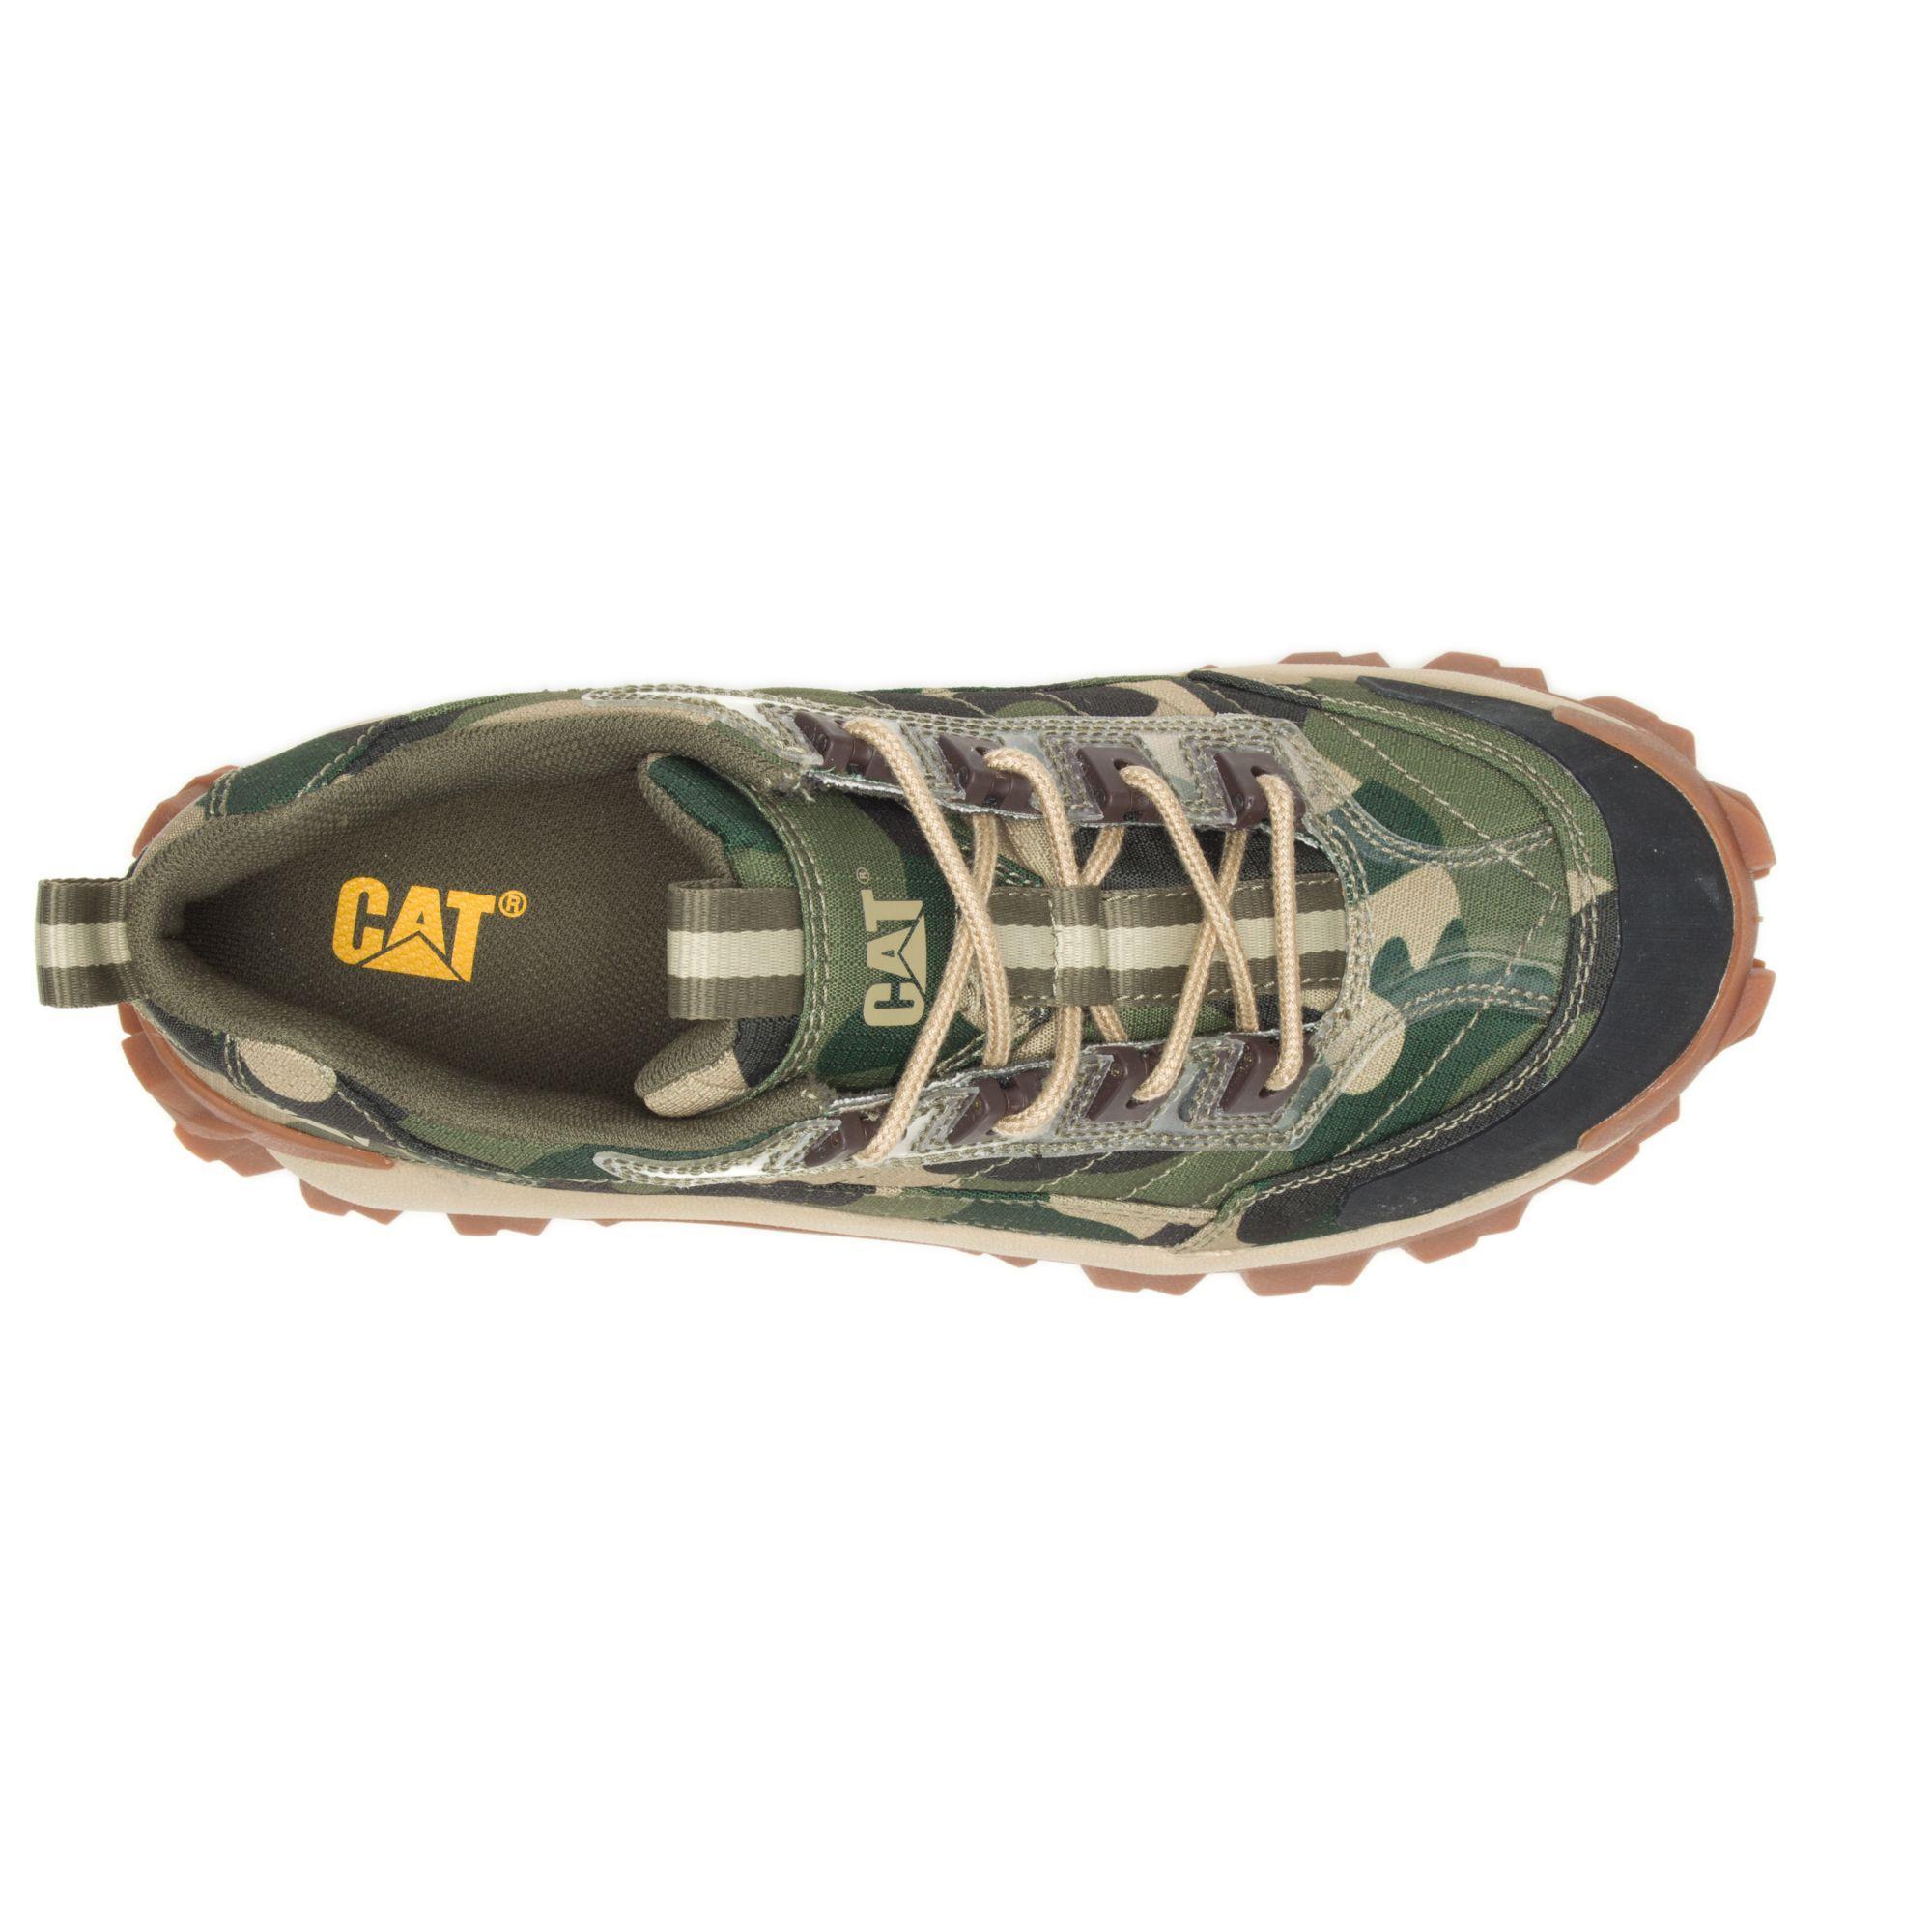 cat intruder boots